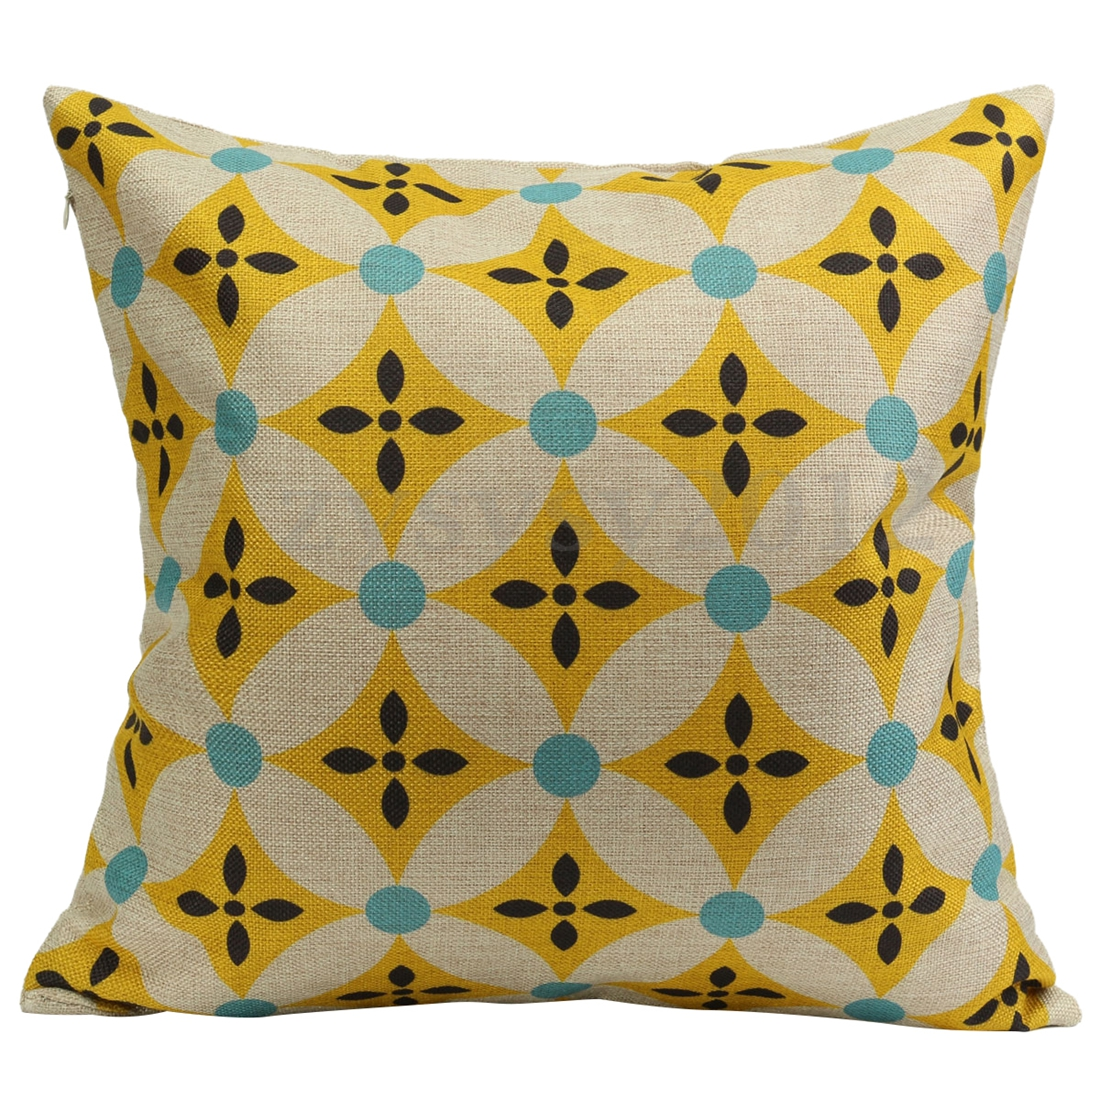 Geometric Flower Vintage Cotton Linen Pillow Case Cushion Cover Home Sofa Decor, yellow